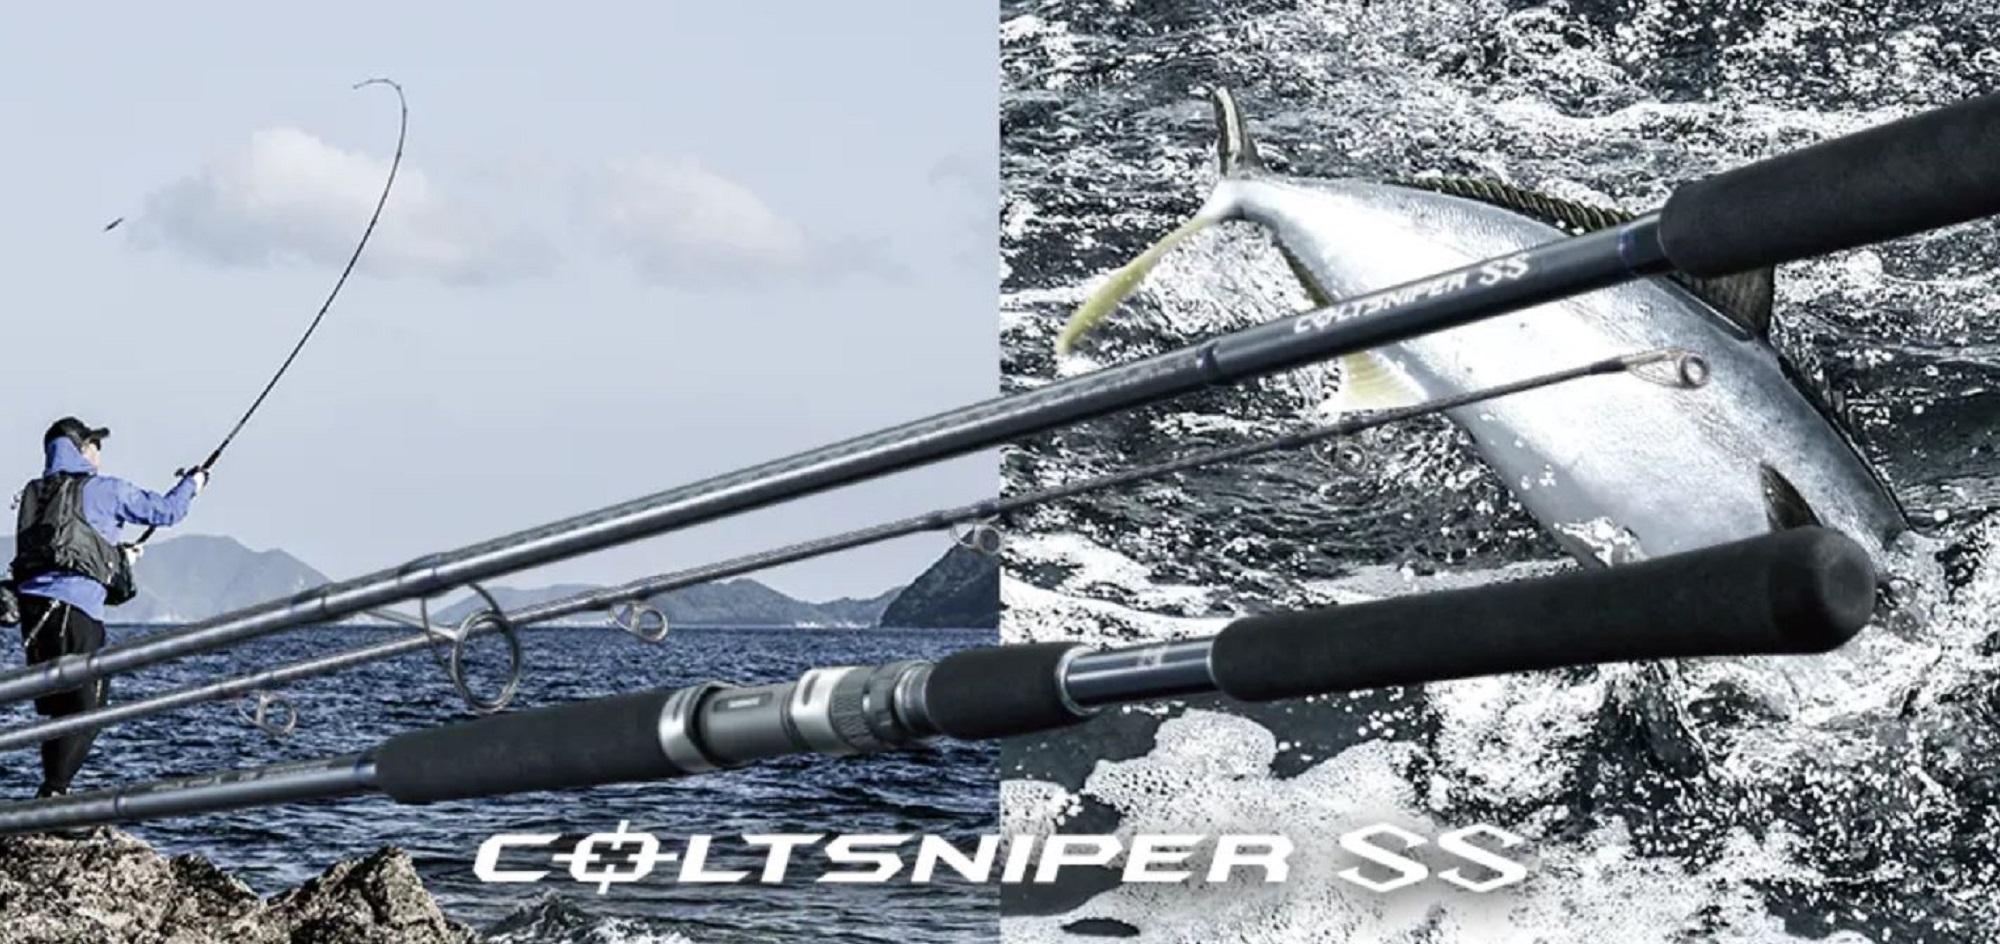 Shimano Rod Spinning Colt Sniper SS S106MH (4521)